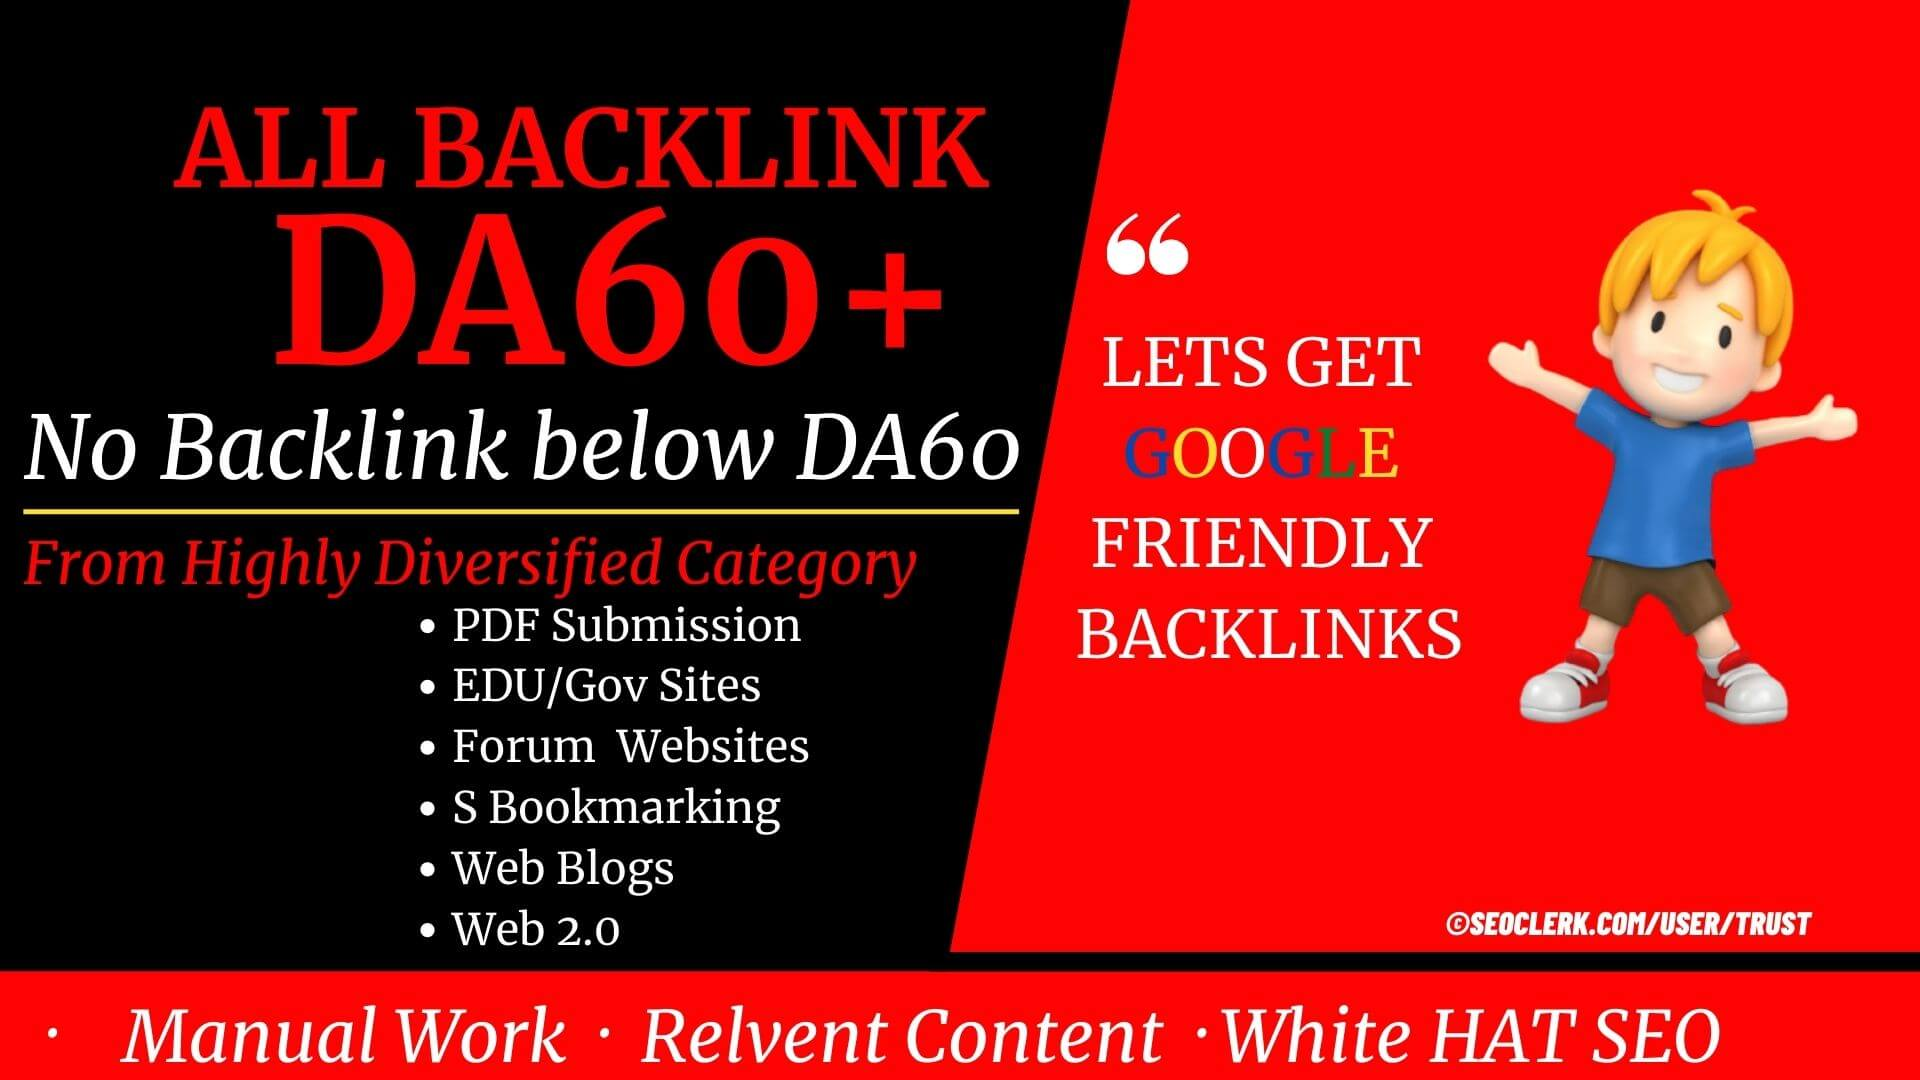 No Cheap Backlinks,  Only DA60+ premium Backlinks 53+ Backlinks from Wiki,  PDF,  Gov,  Edu,  and Forum